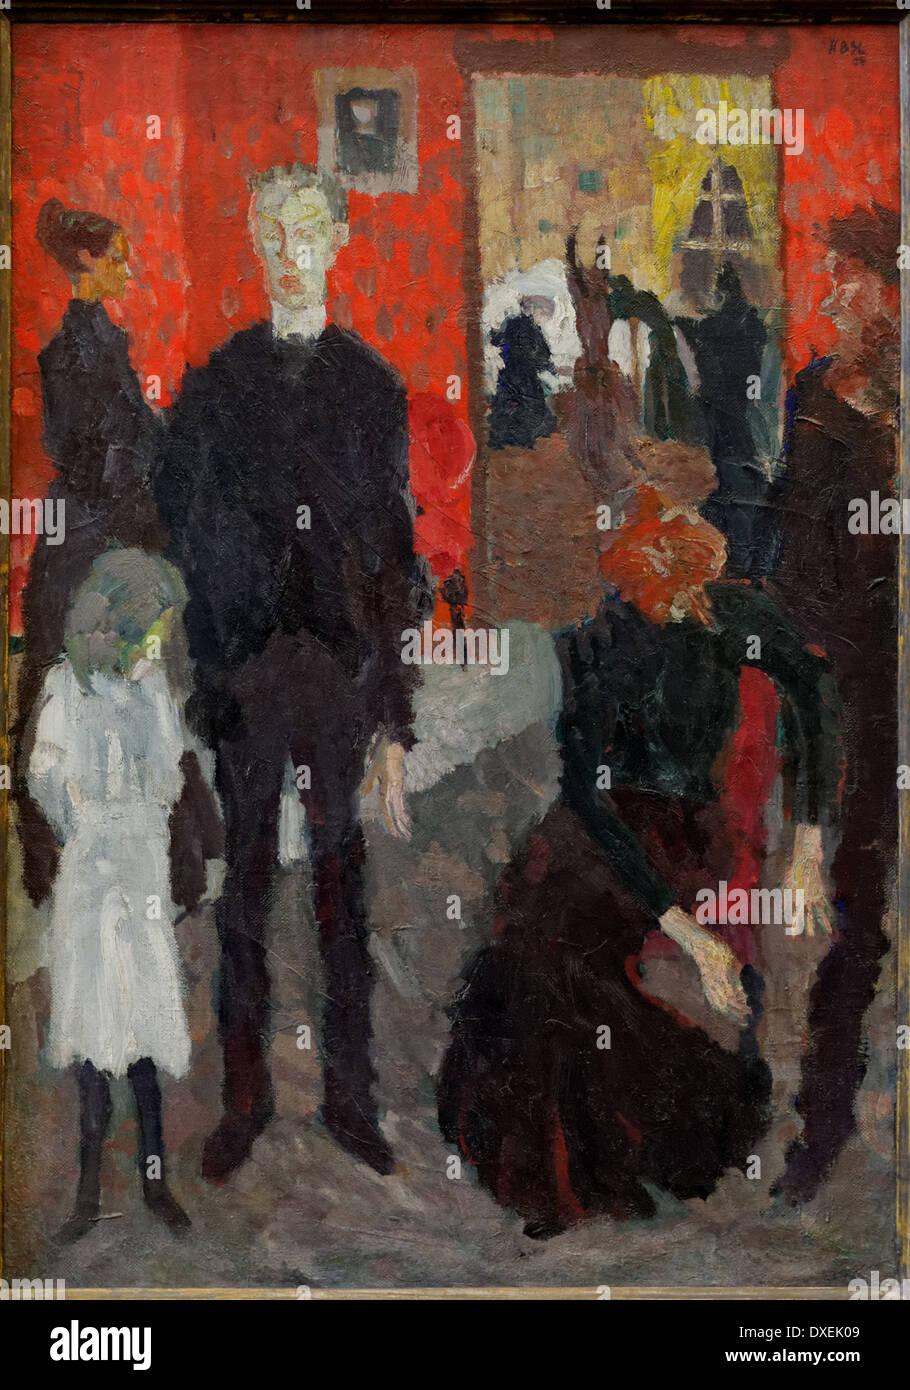 Max Beckmann - Small Death Scene - 1909 - XX th century - German school - Alte Nationalgalerie - Berlin - Stock Image